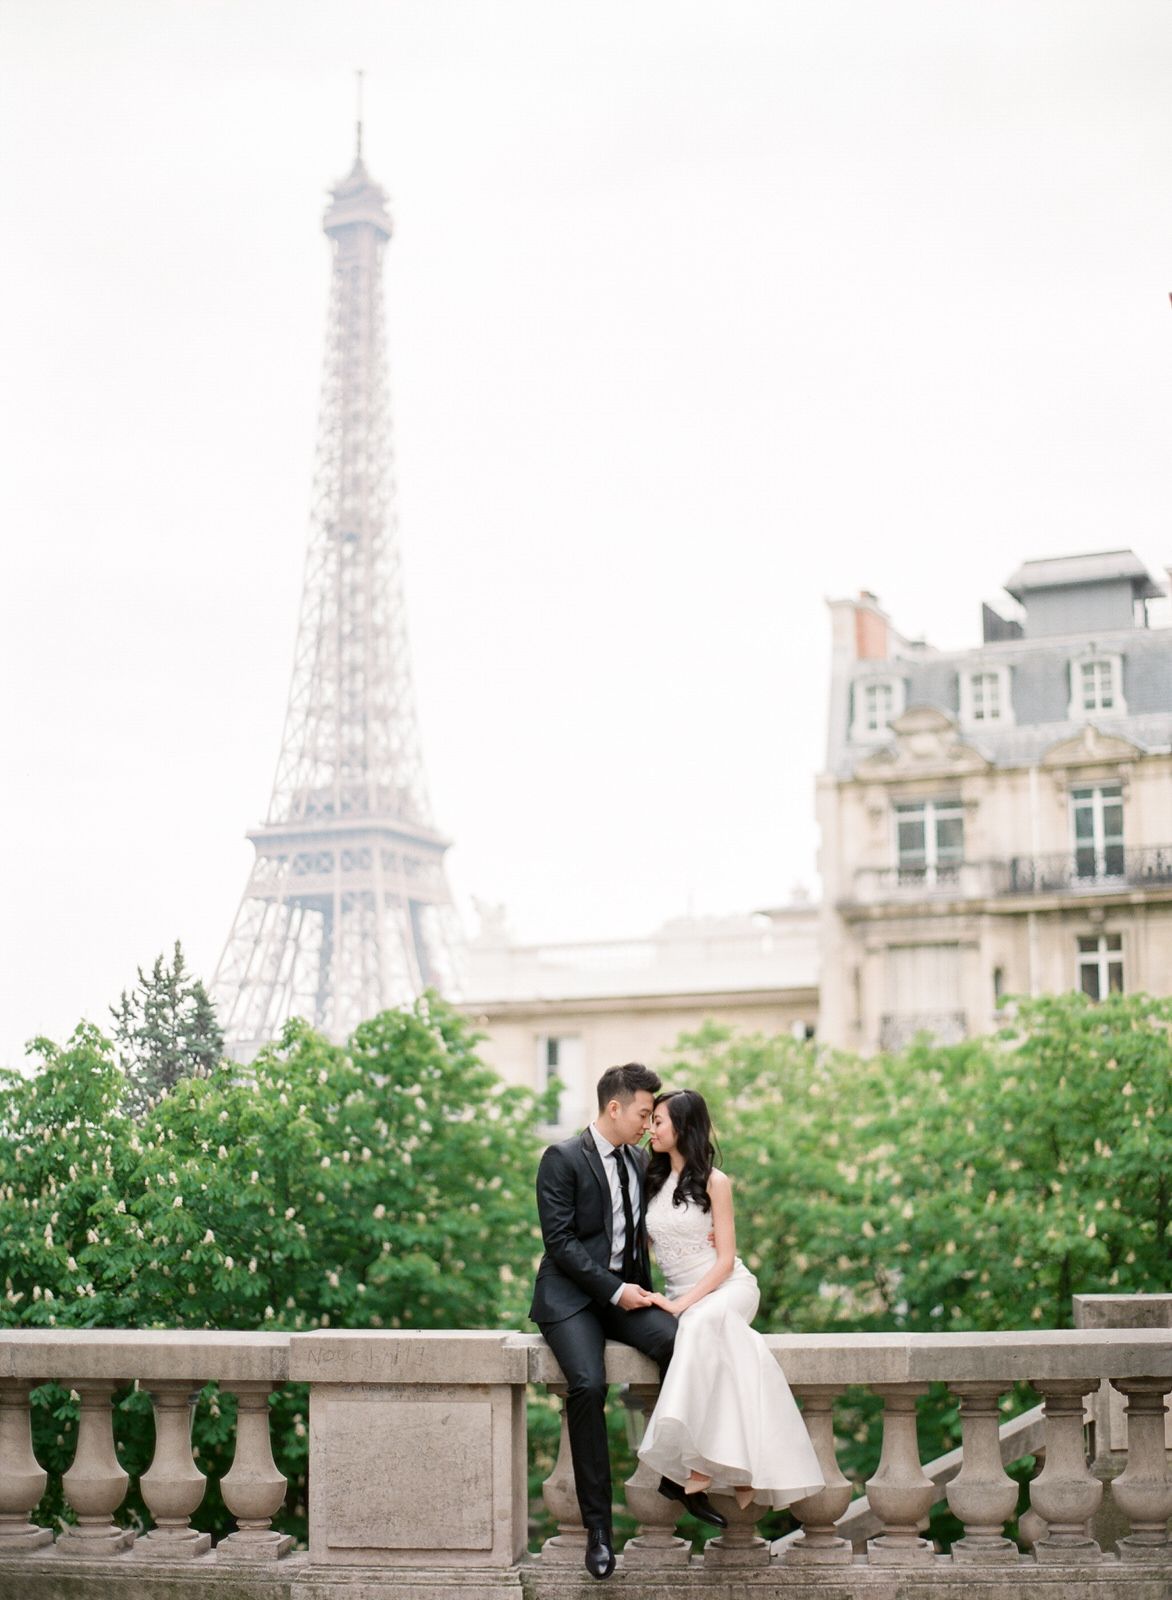 Paris Destination Pre-Wedding | Veronica & Wilson | photo by: AR